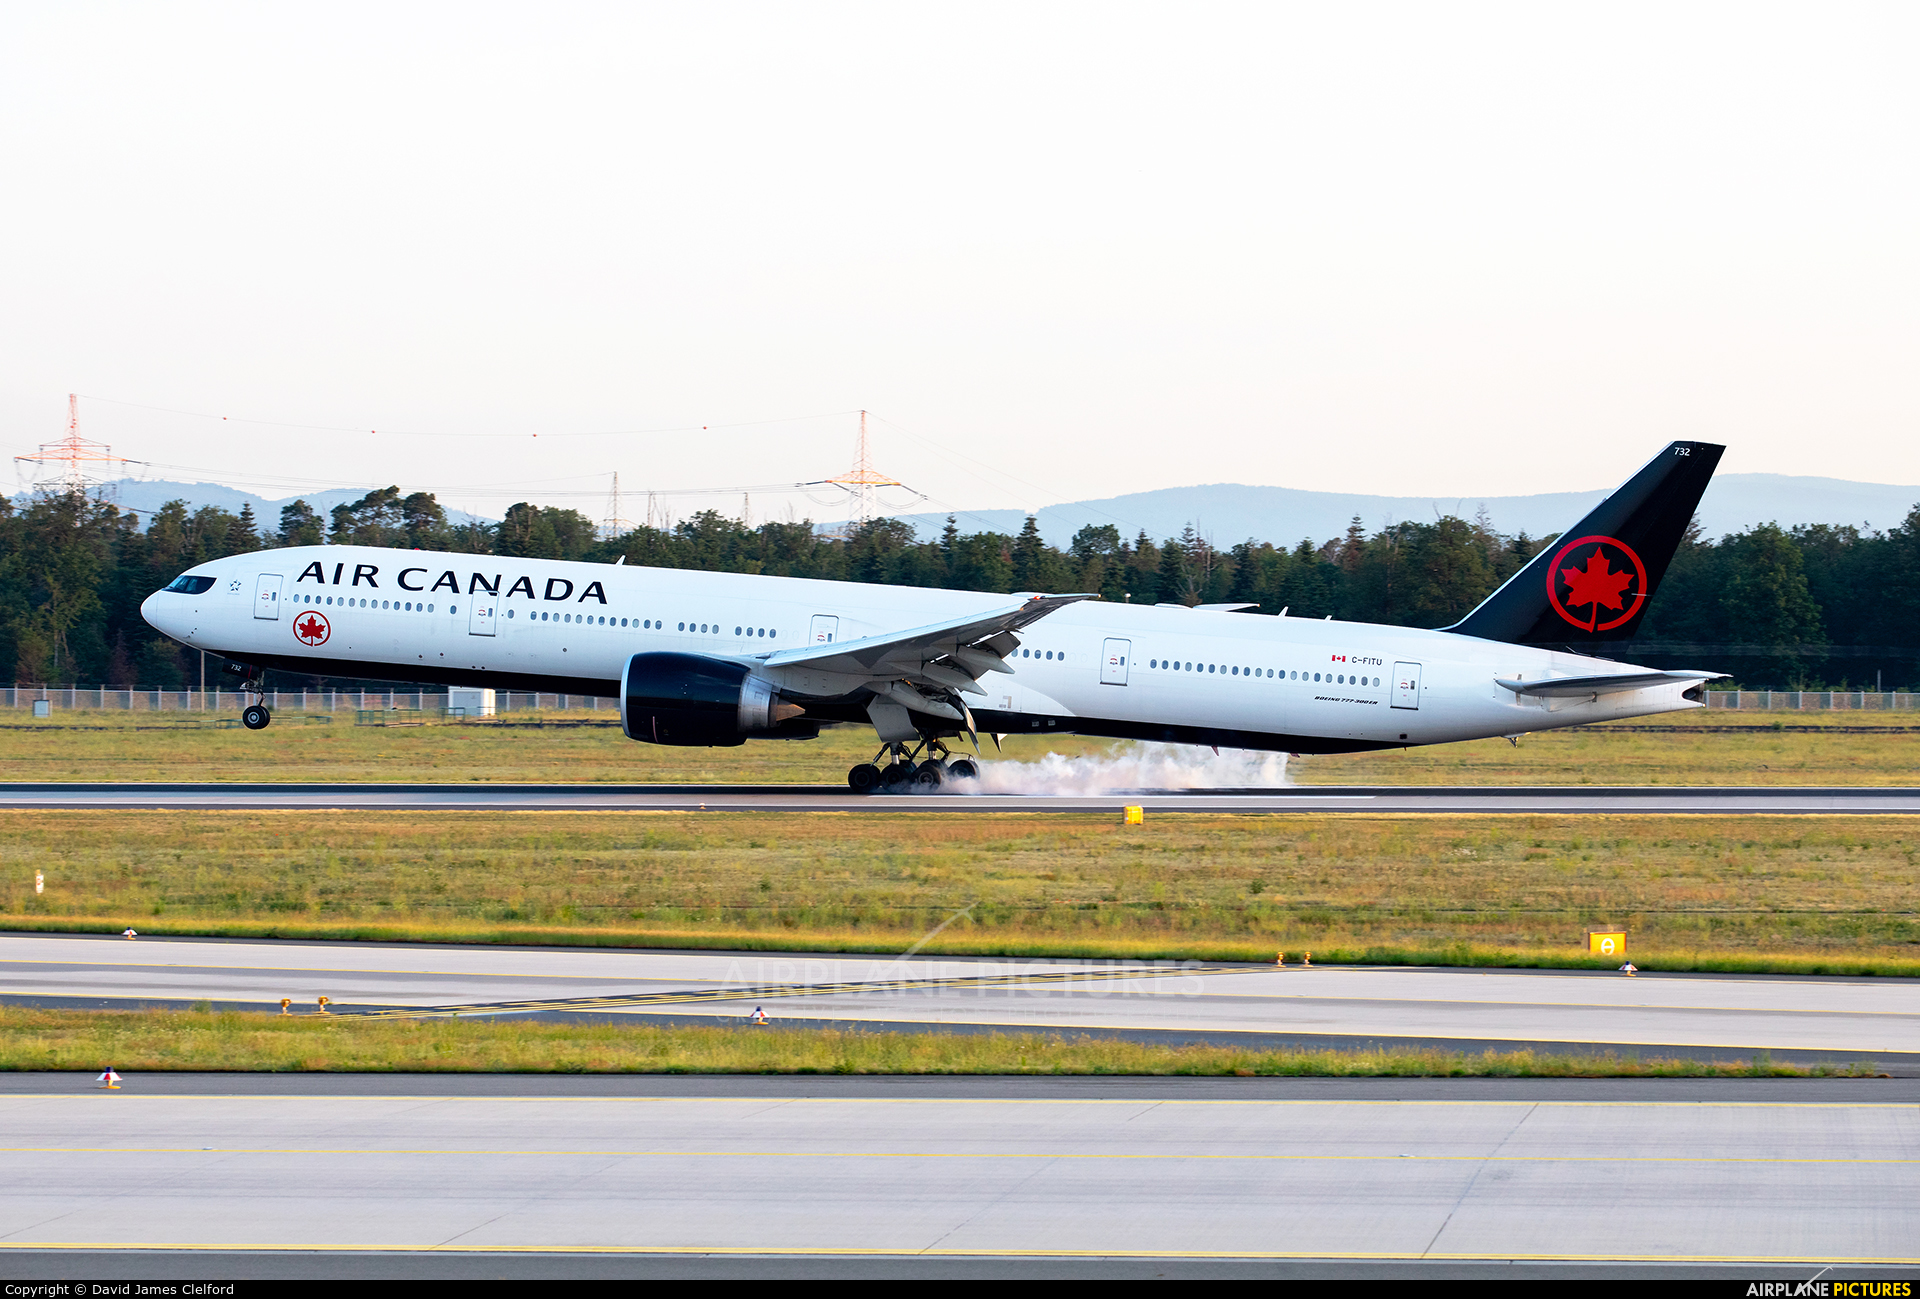 Air Canada C-FITU aircraft at Frankfurt